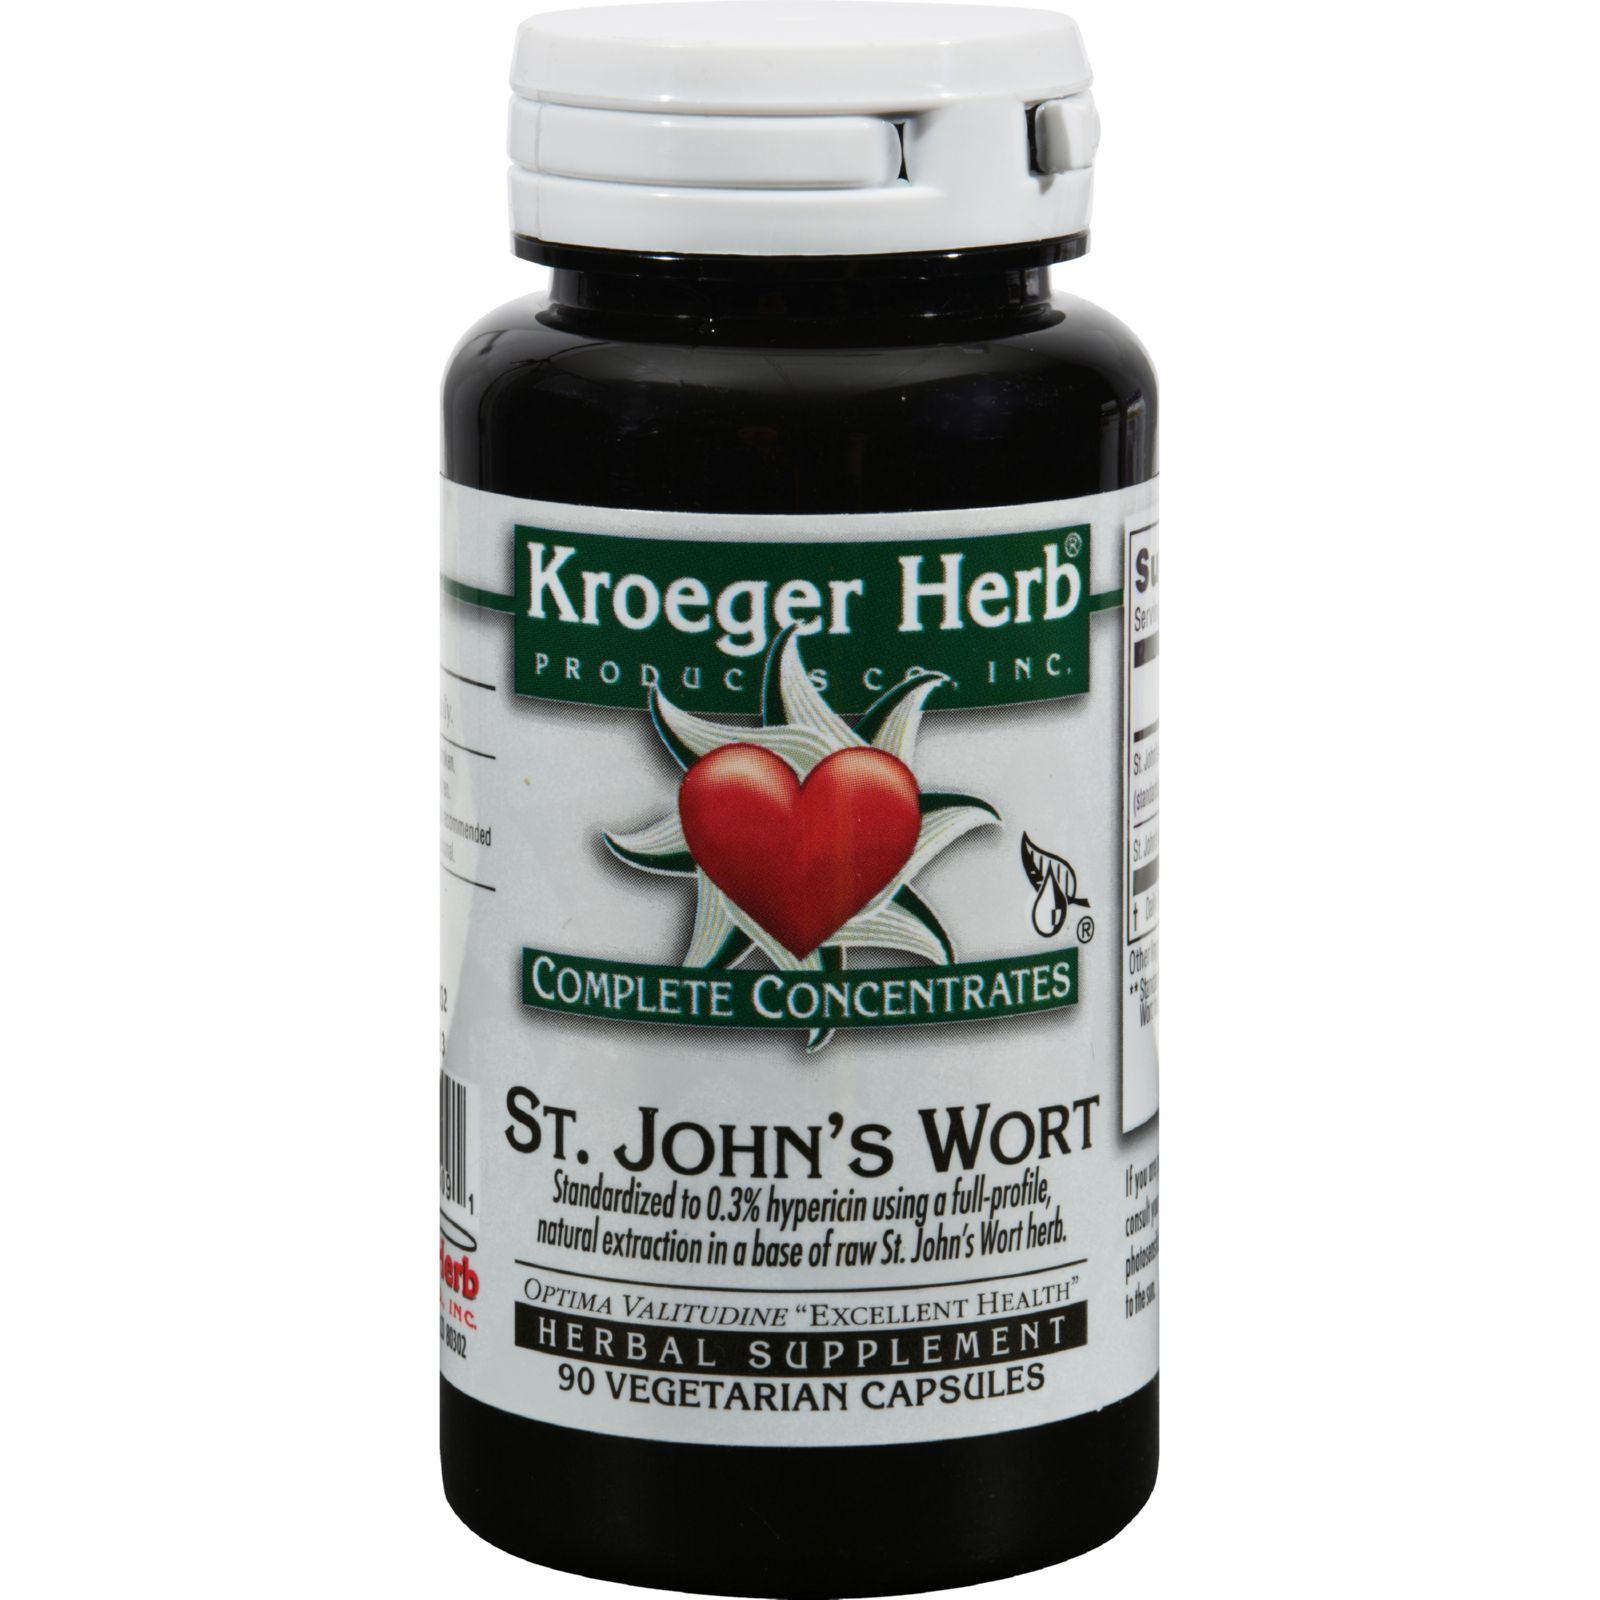 Kroeger Herb St John's Wort - 90 Vegetarian Capsules